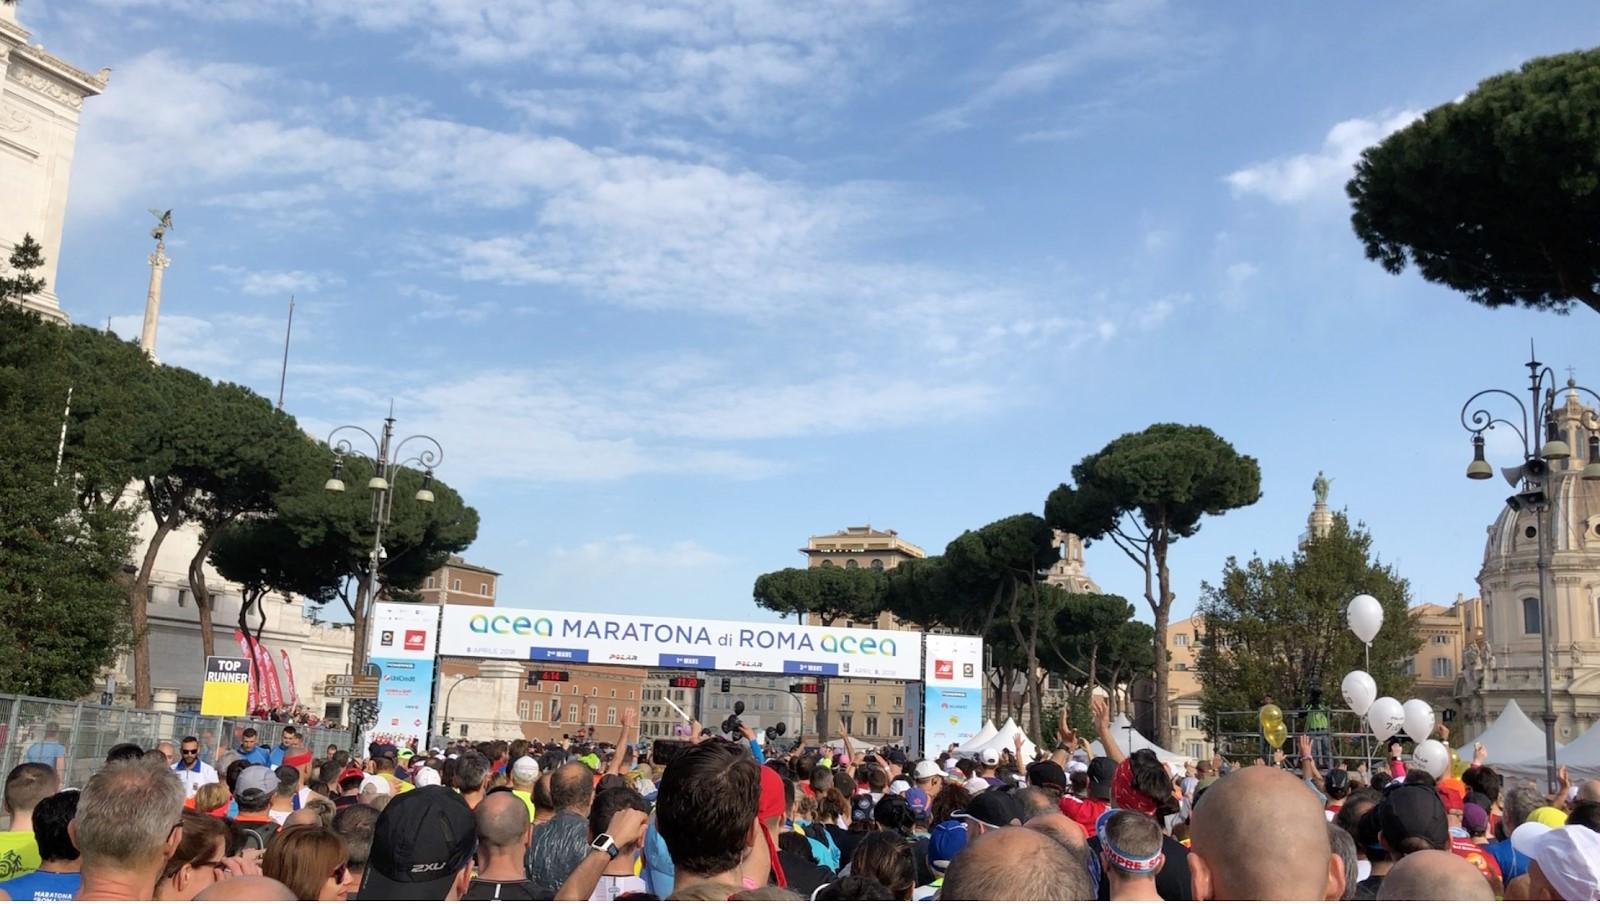 [Хабра-оффтоп] Maratona di Roma, или первый марафон для ИТ-шника - 16